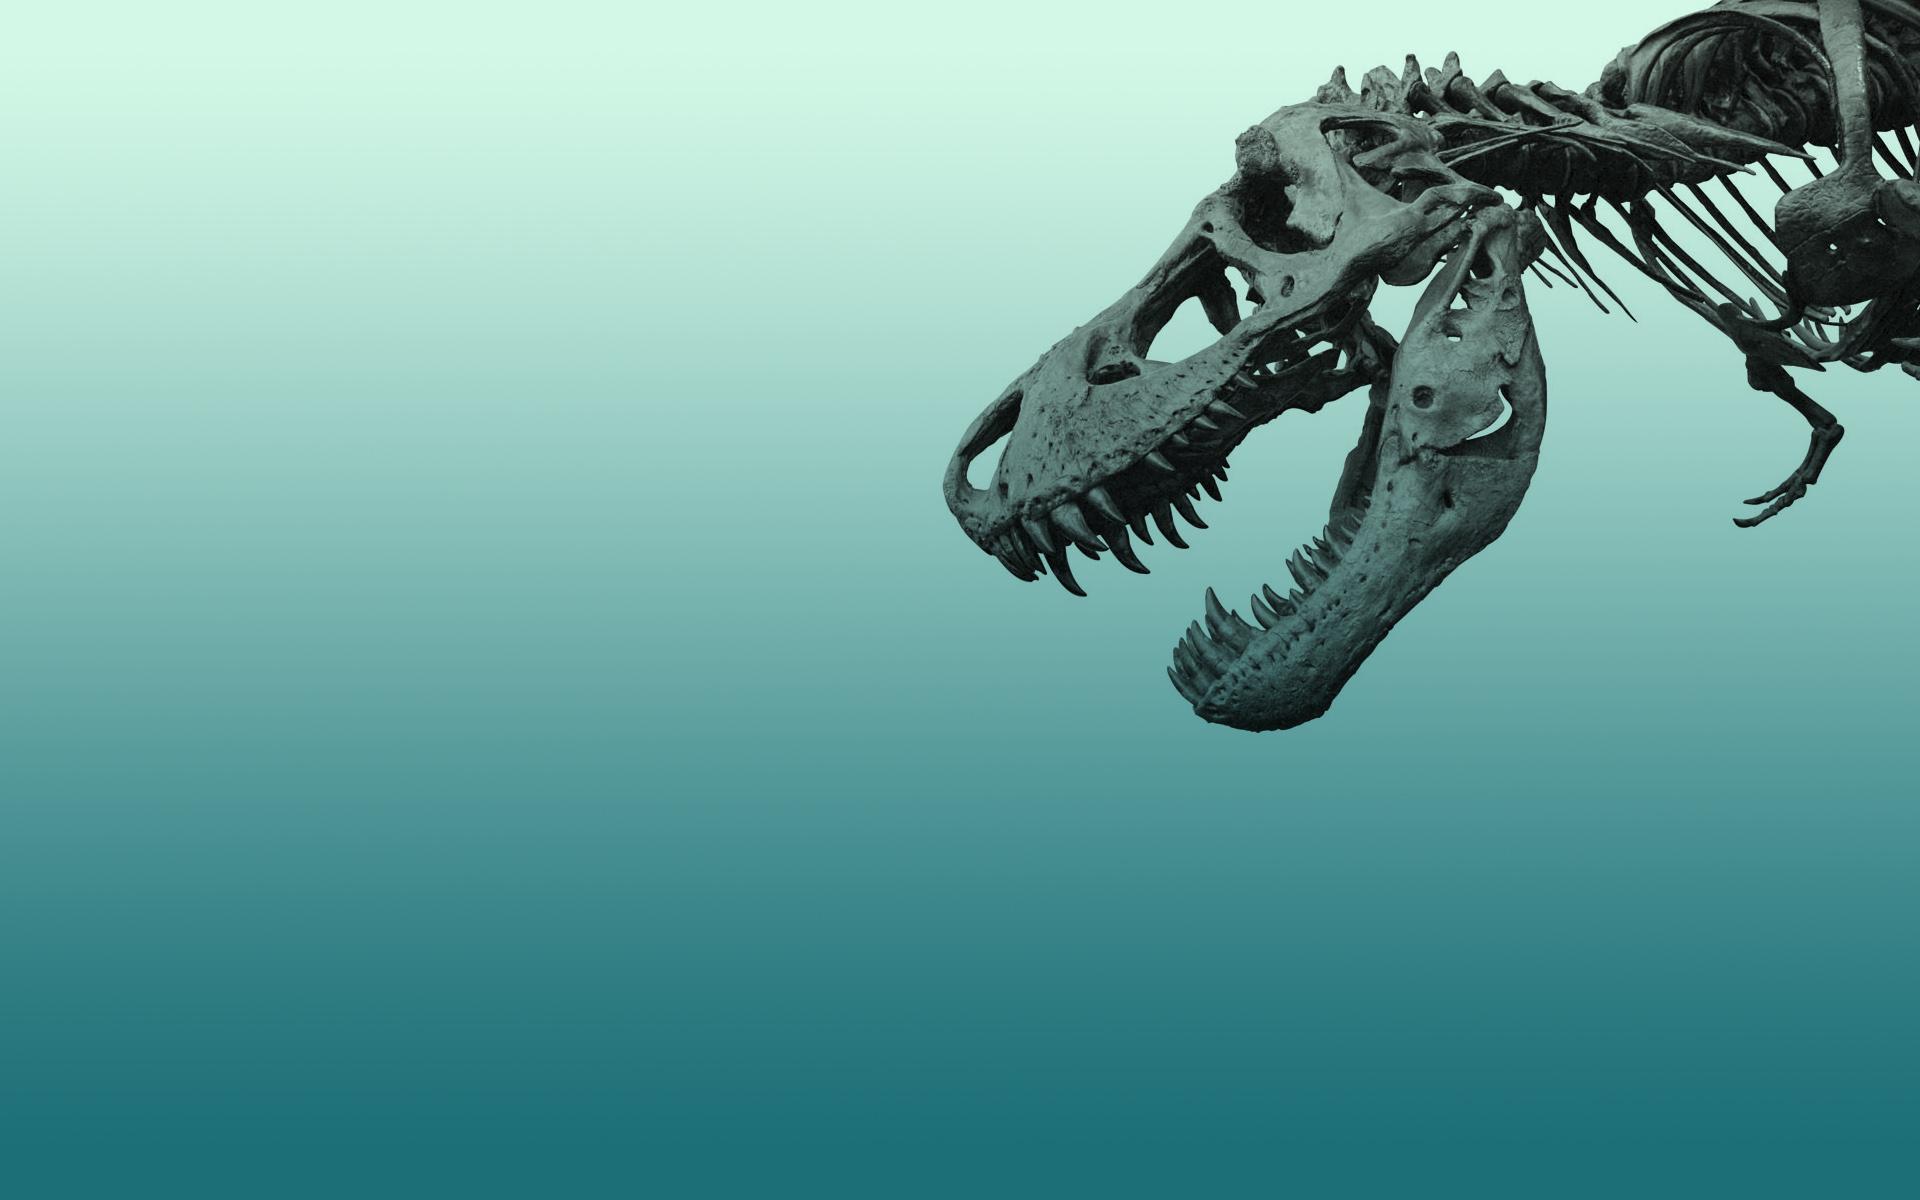 Dinosaur Wallpaper 2 T Rex Skeleton 1920x1200